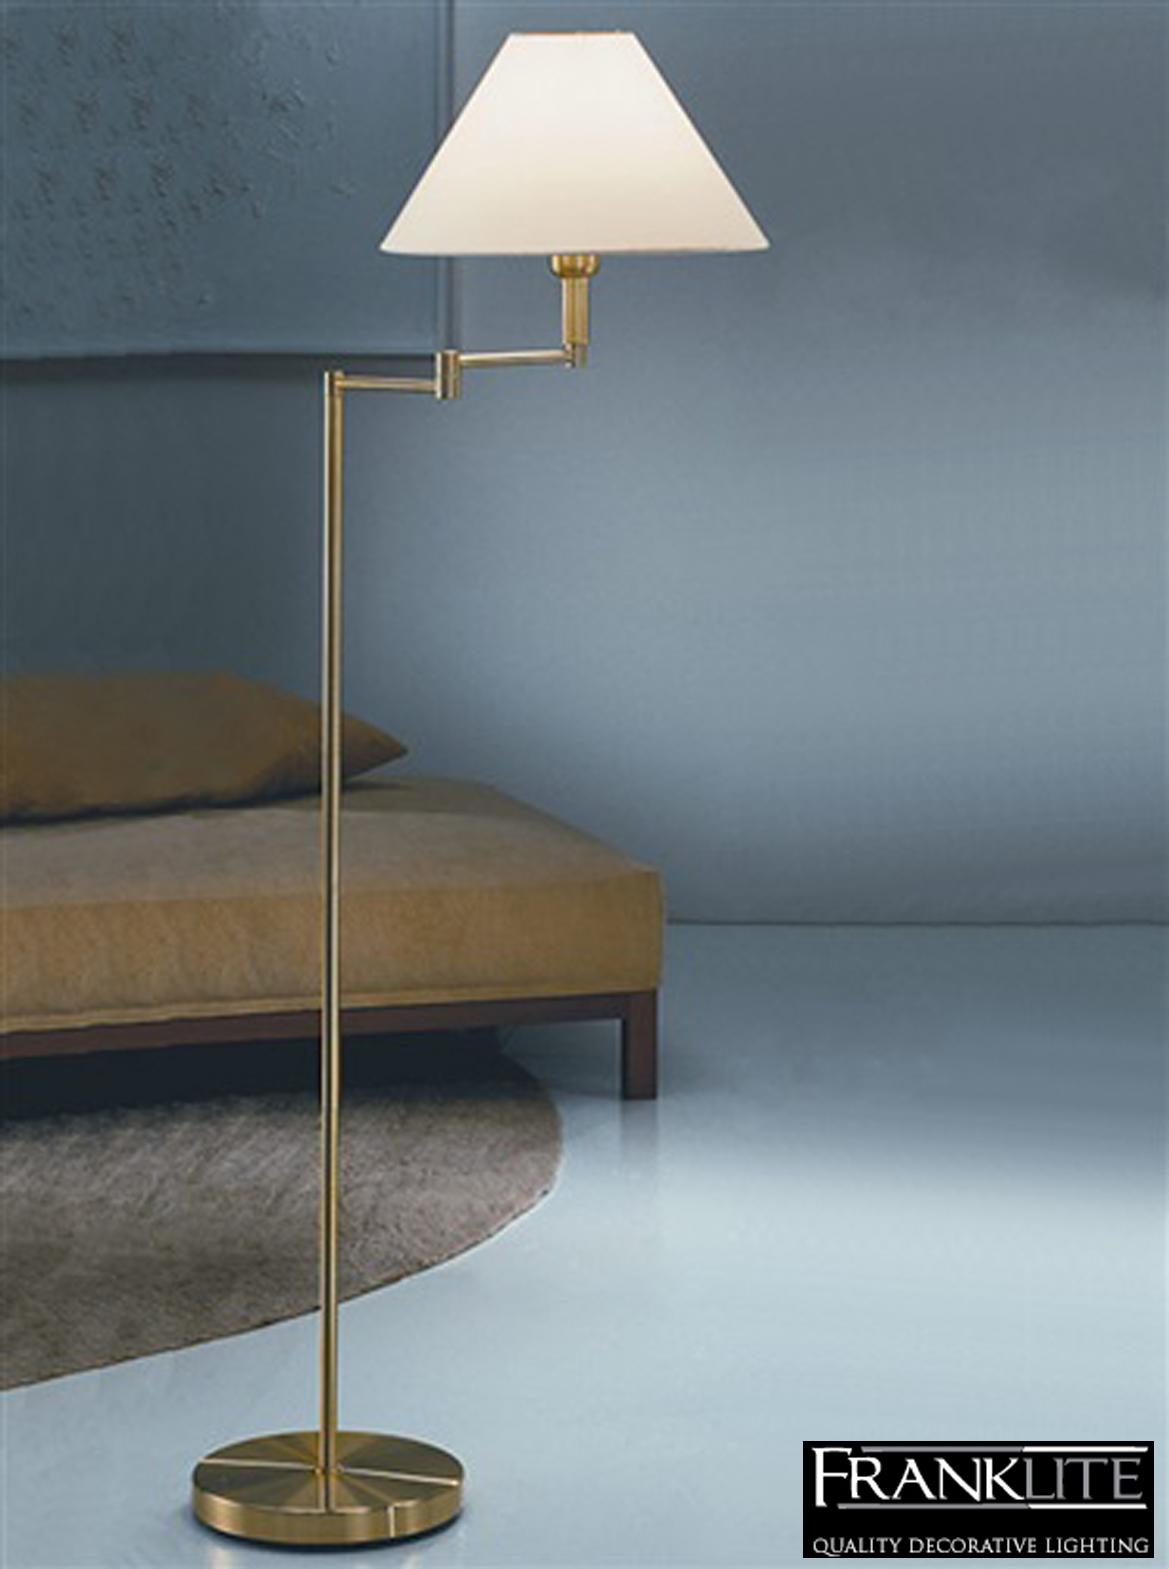 Franklite Swing Arm Floor Lamp Brass Finish With Cream